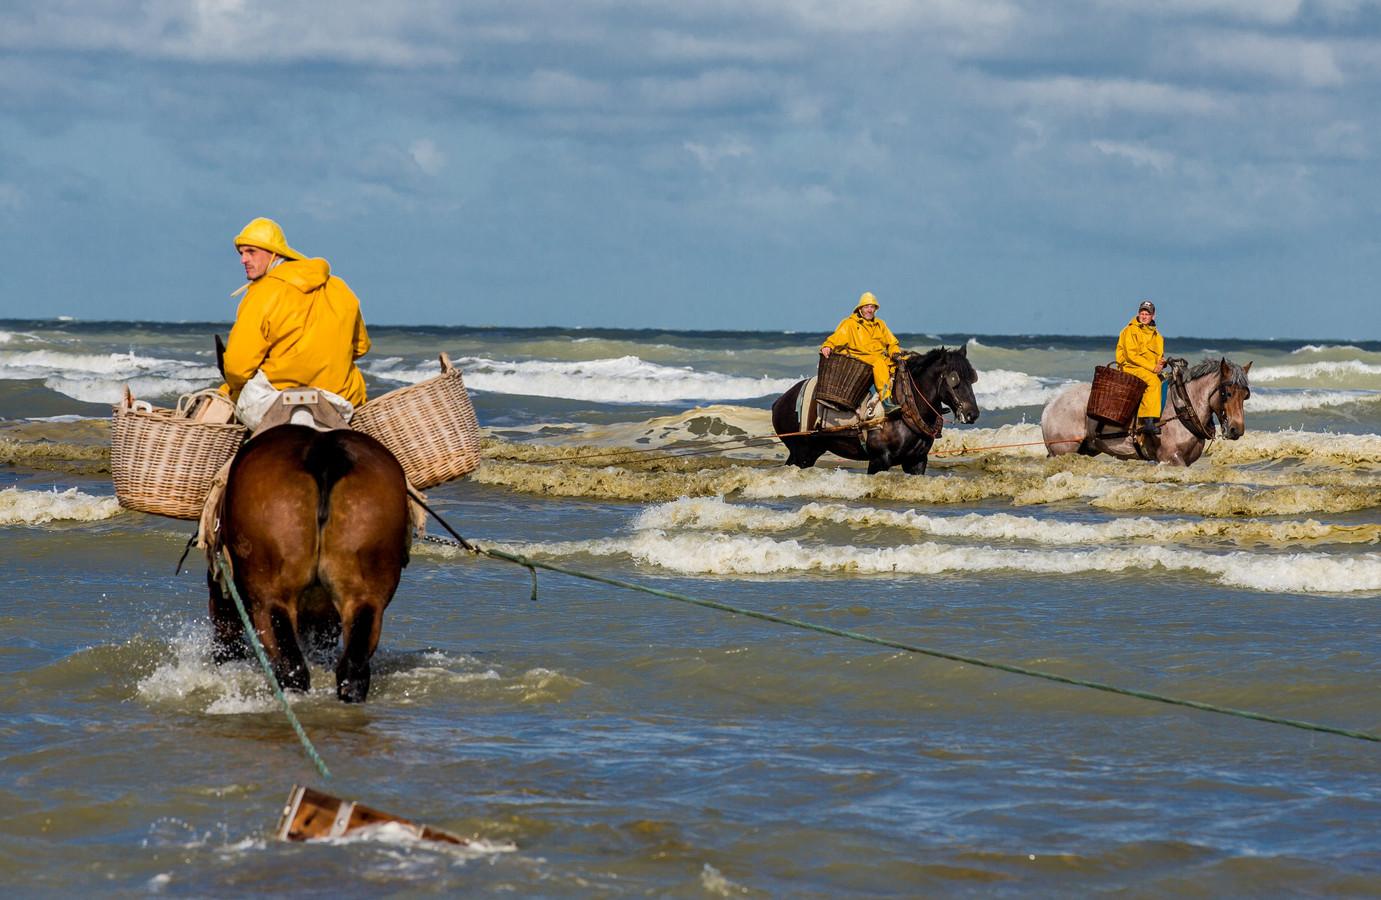 Garnalenvissers in Oostduinkerke.